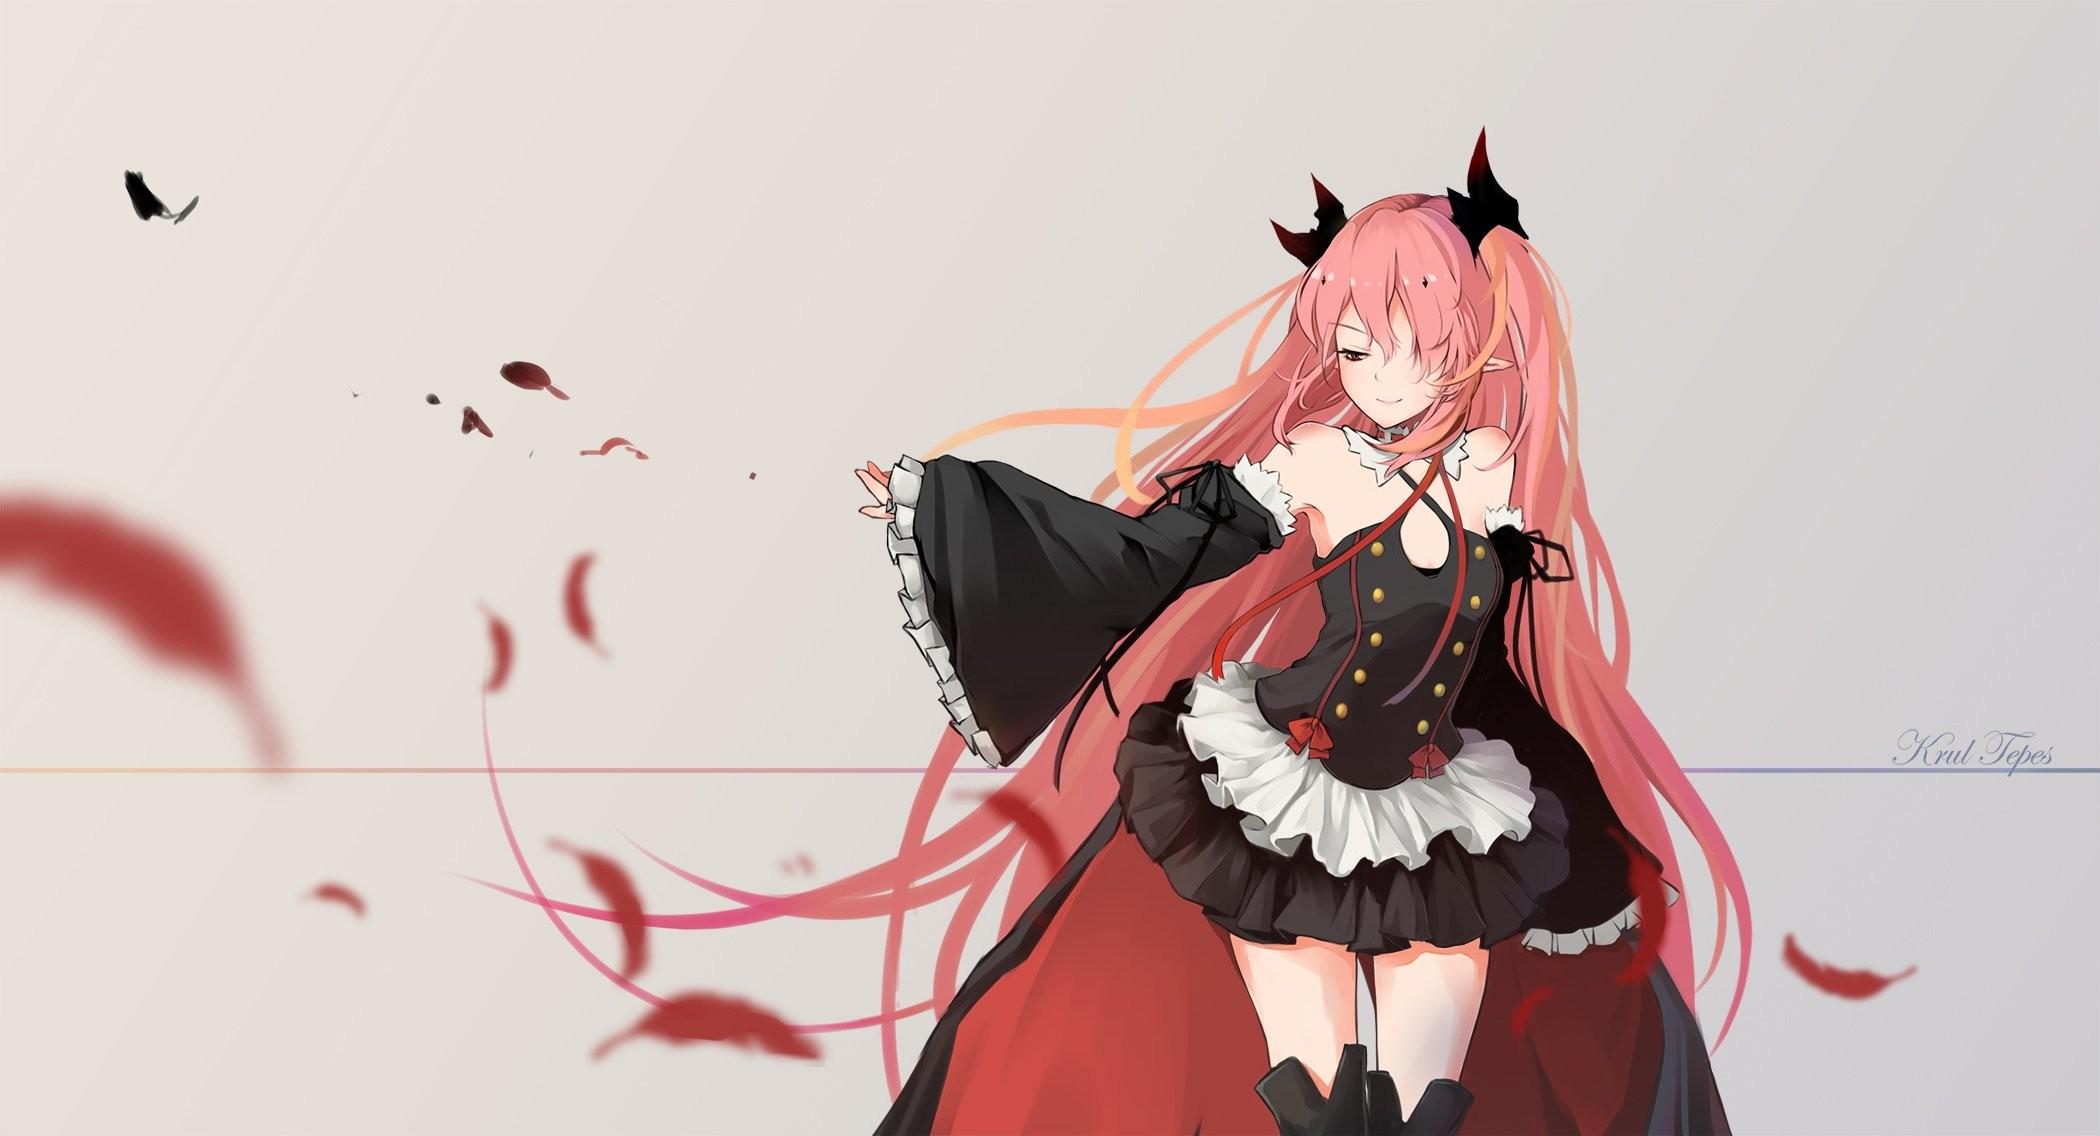 Owari no Seraph Series anime Character vampire girl dress pink hair  wallpaper | | 1008283 | WallpaperUP